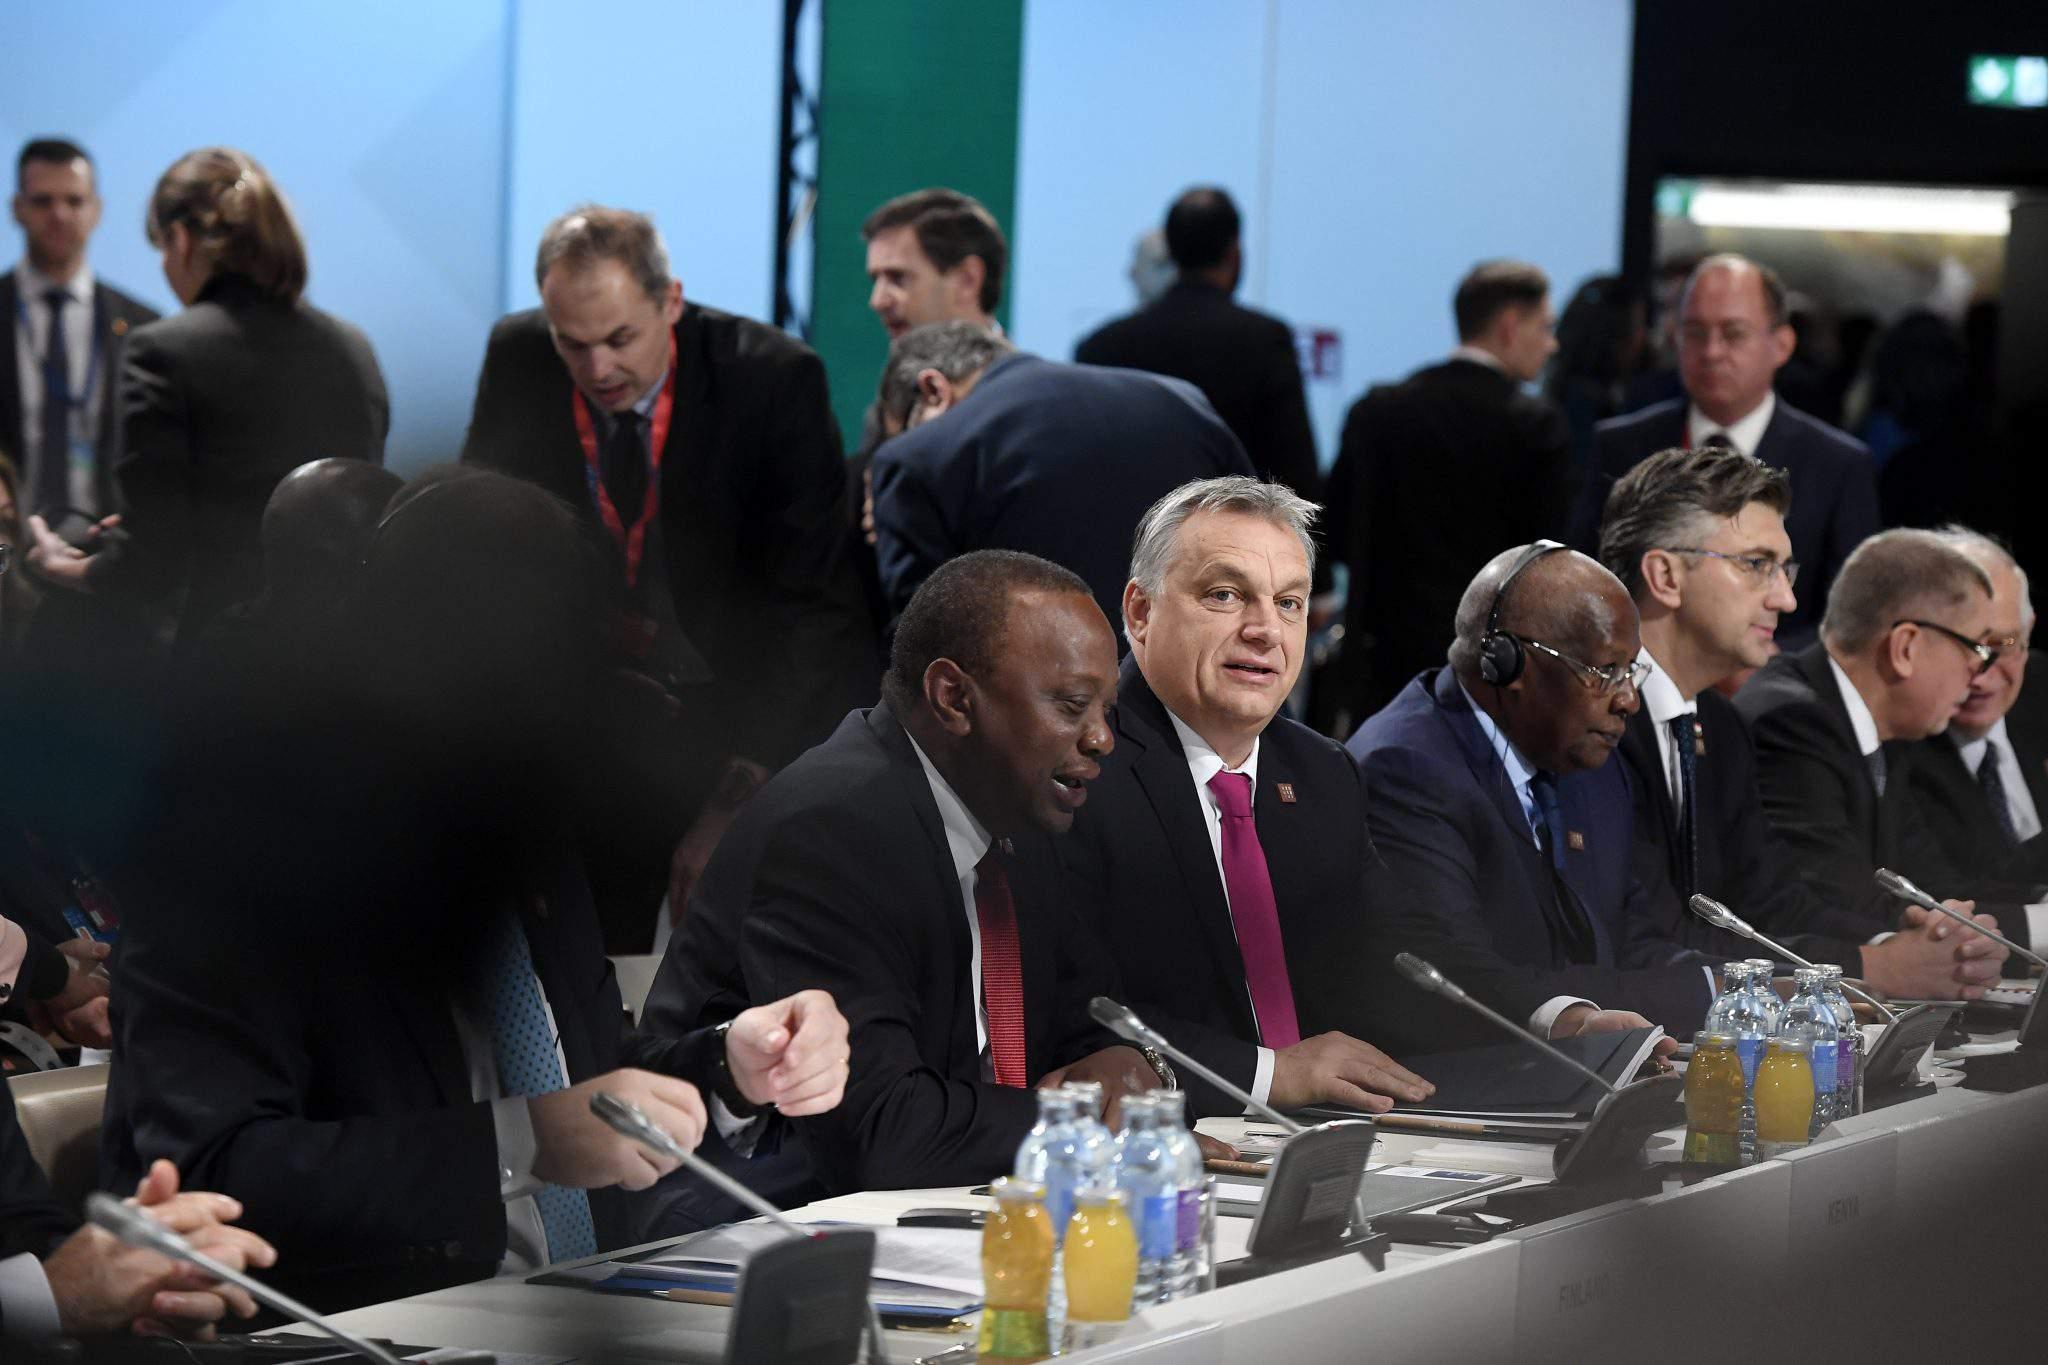 Orbán africa summit